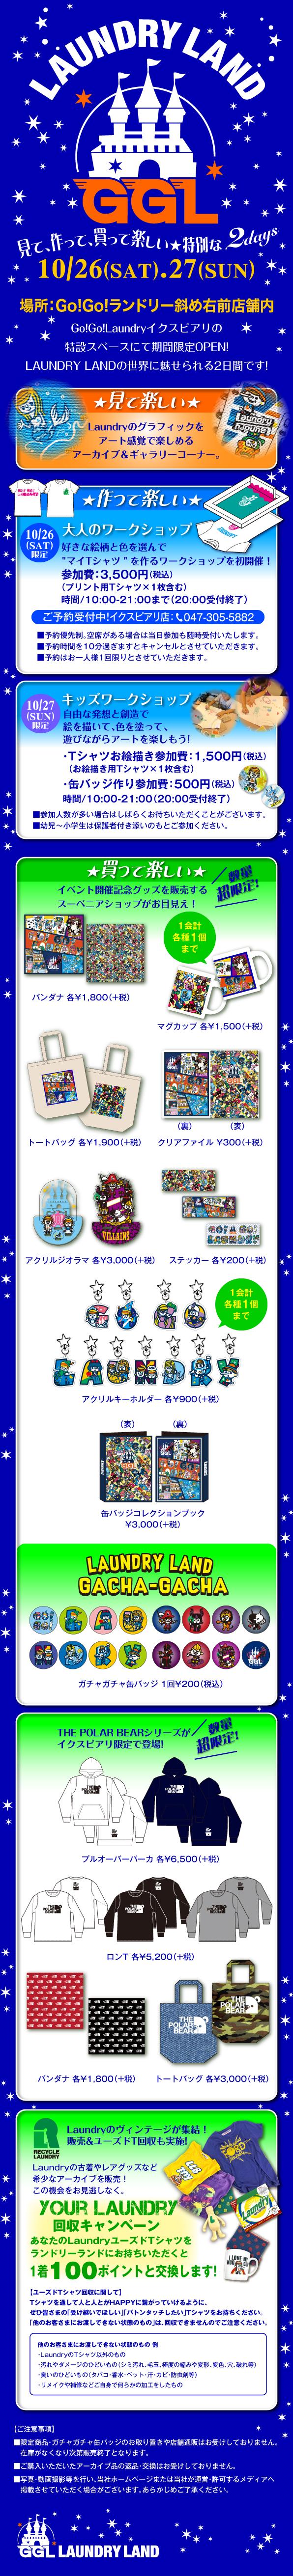 L_LAND_1024_NEWS_PAGE_596x5245